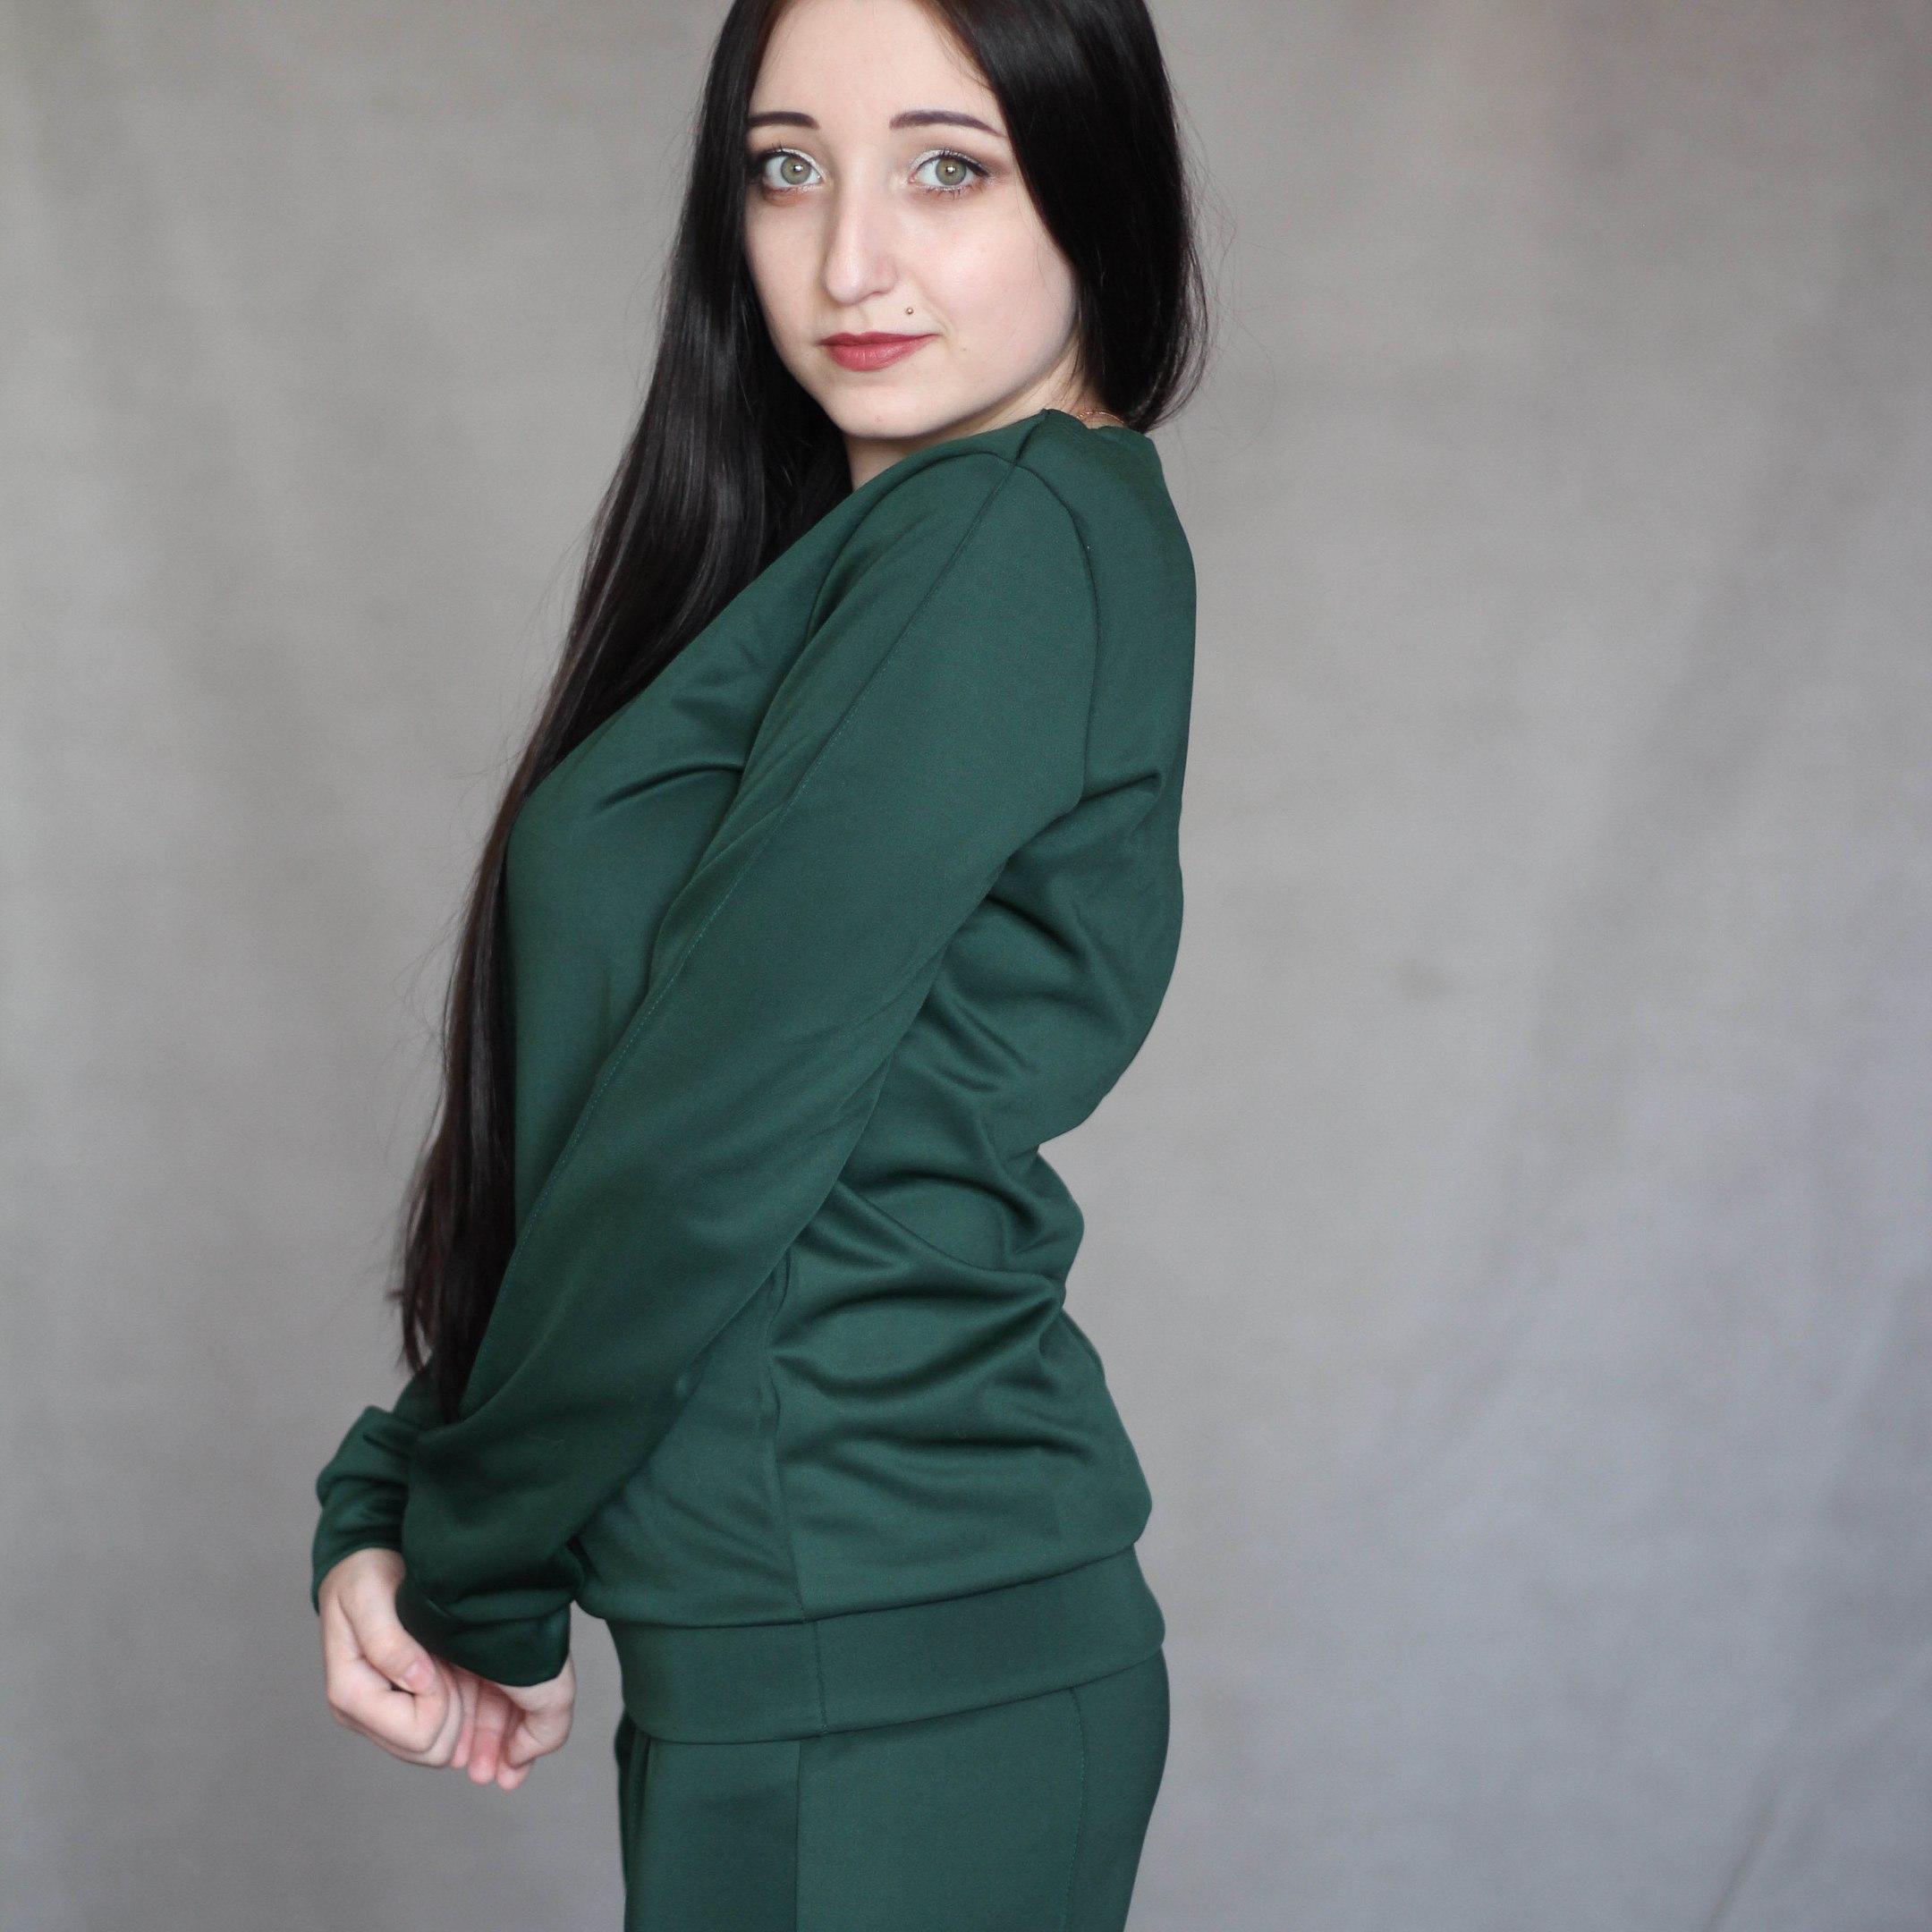 Хороший костюм зеленого цвета